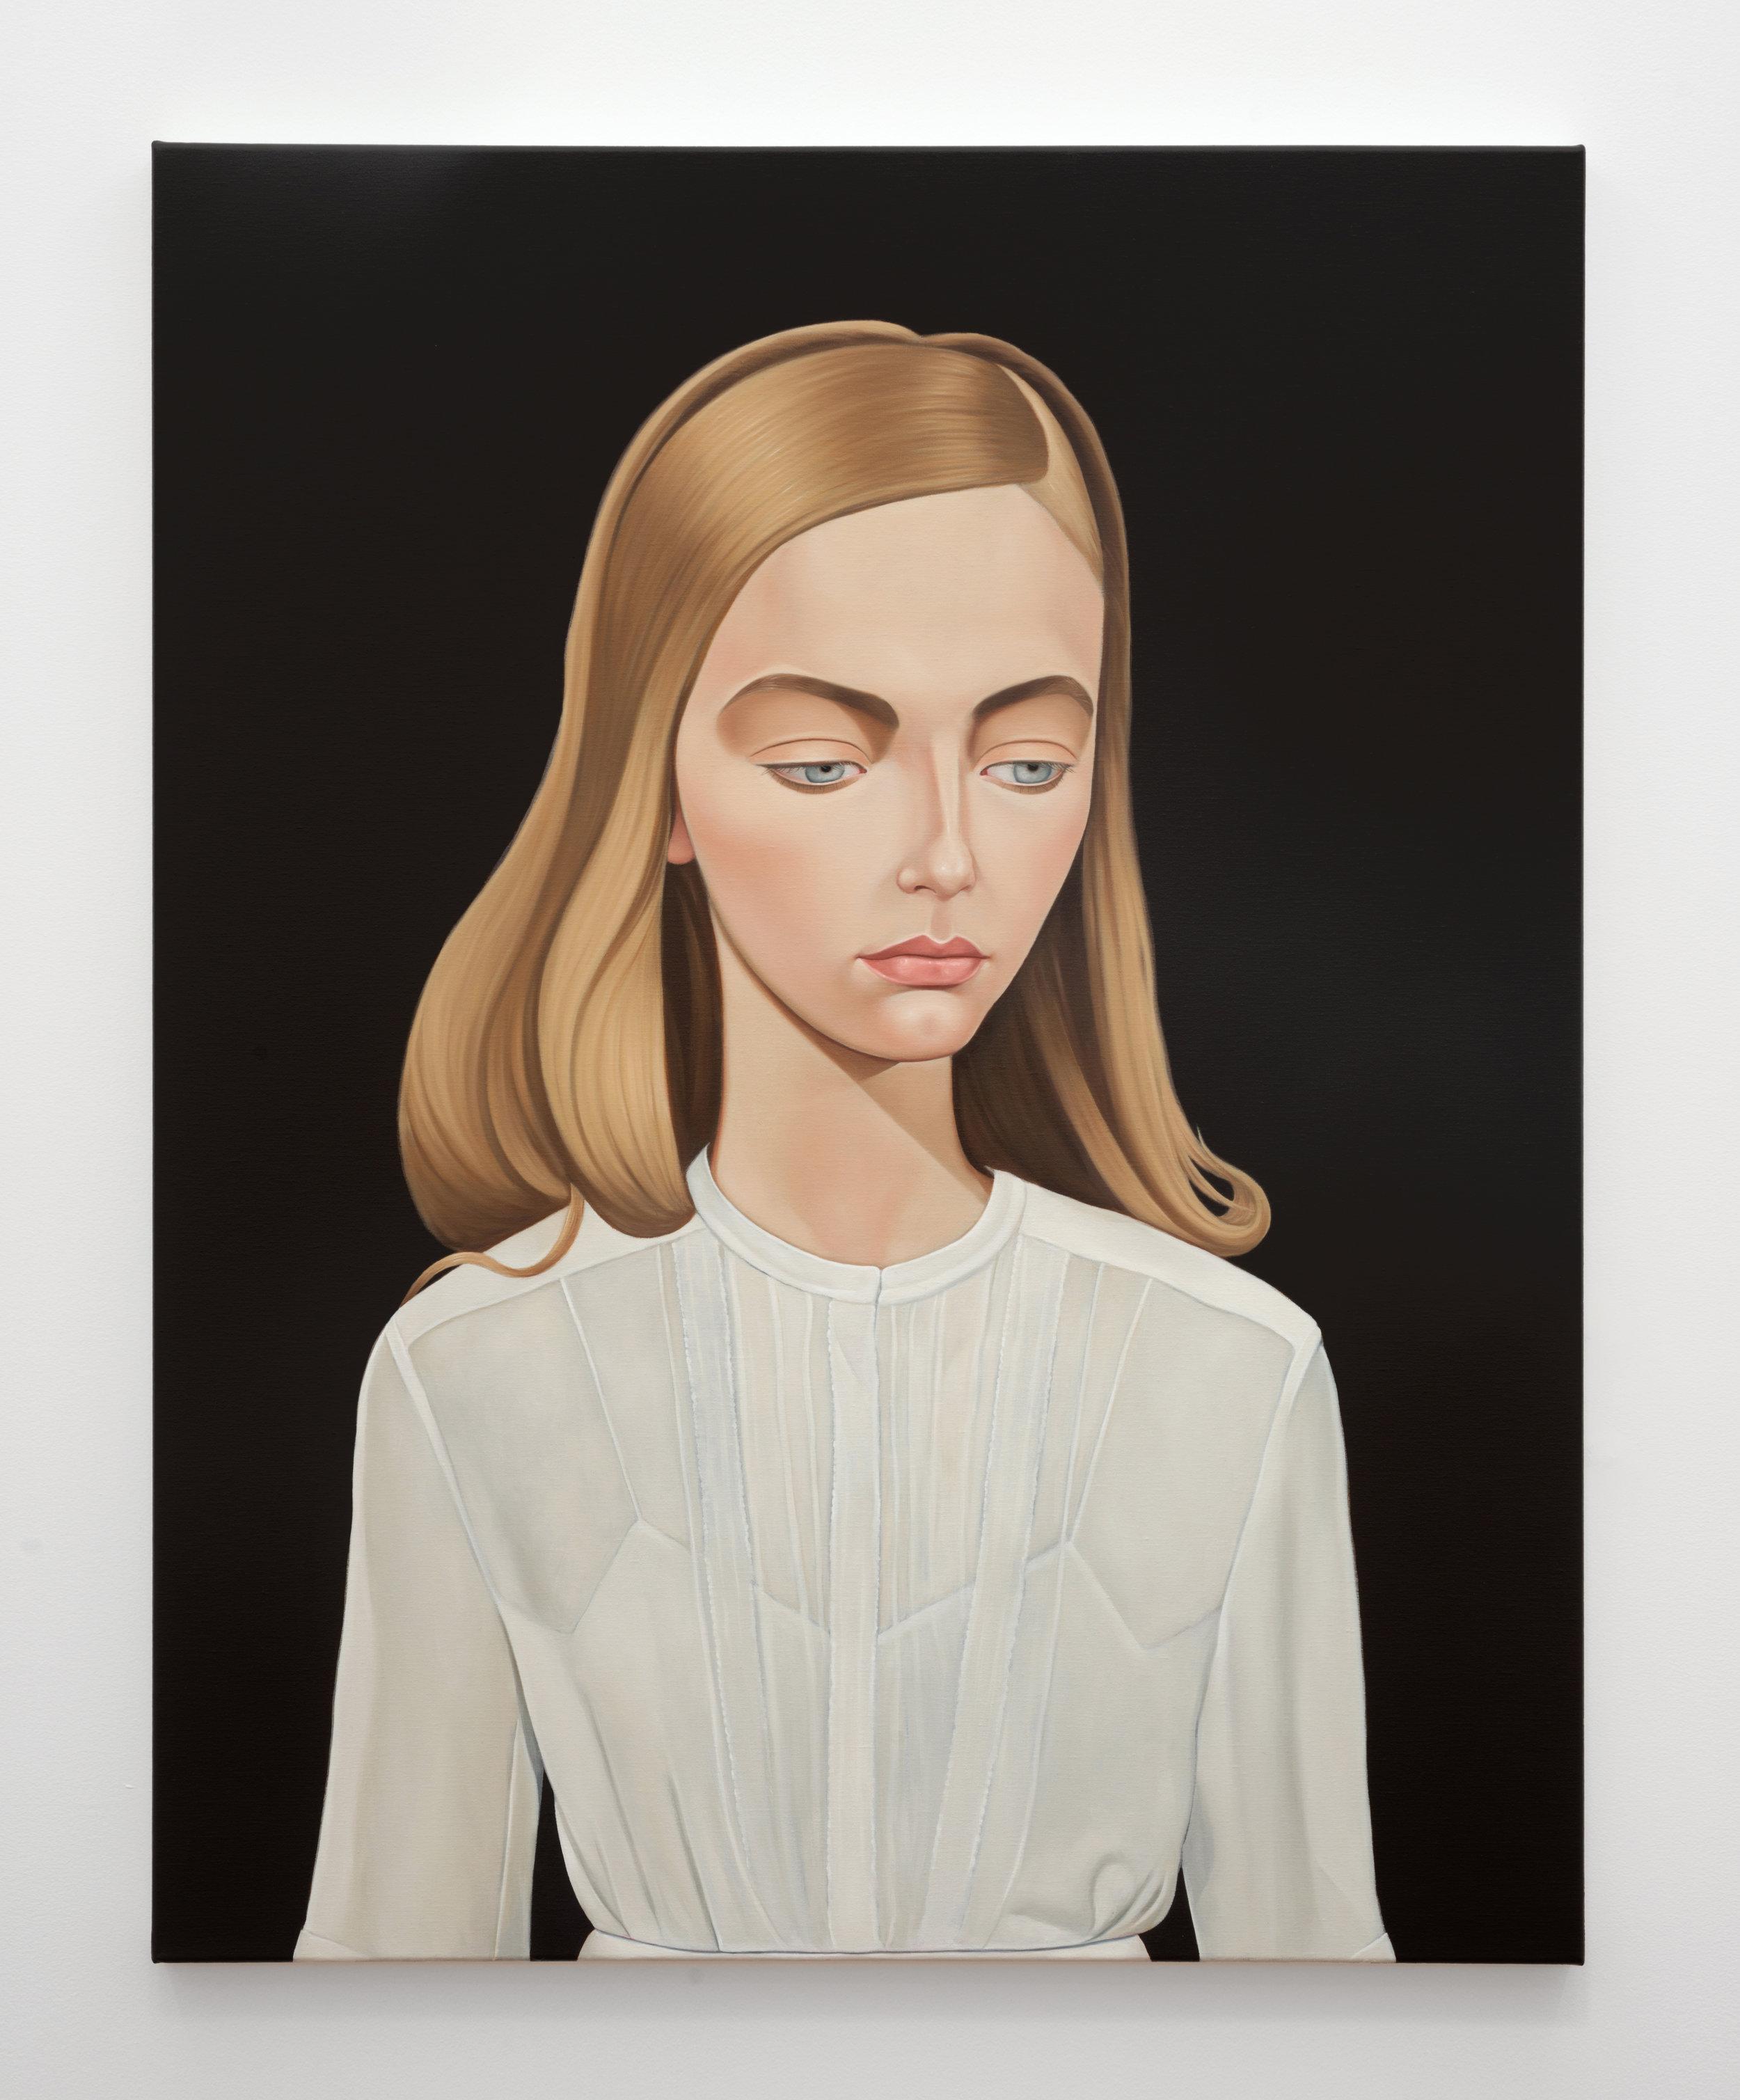 'Pam Reynolds, NDE/OBE, 1991' 2018 Oil on linen 95 x 120 cm